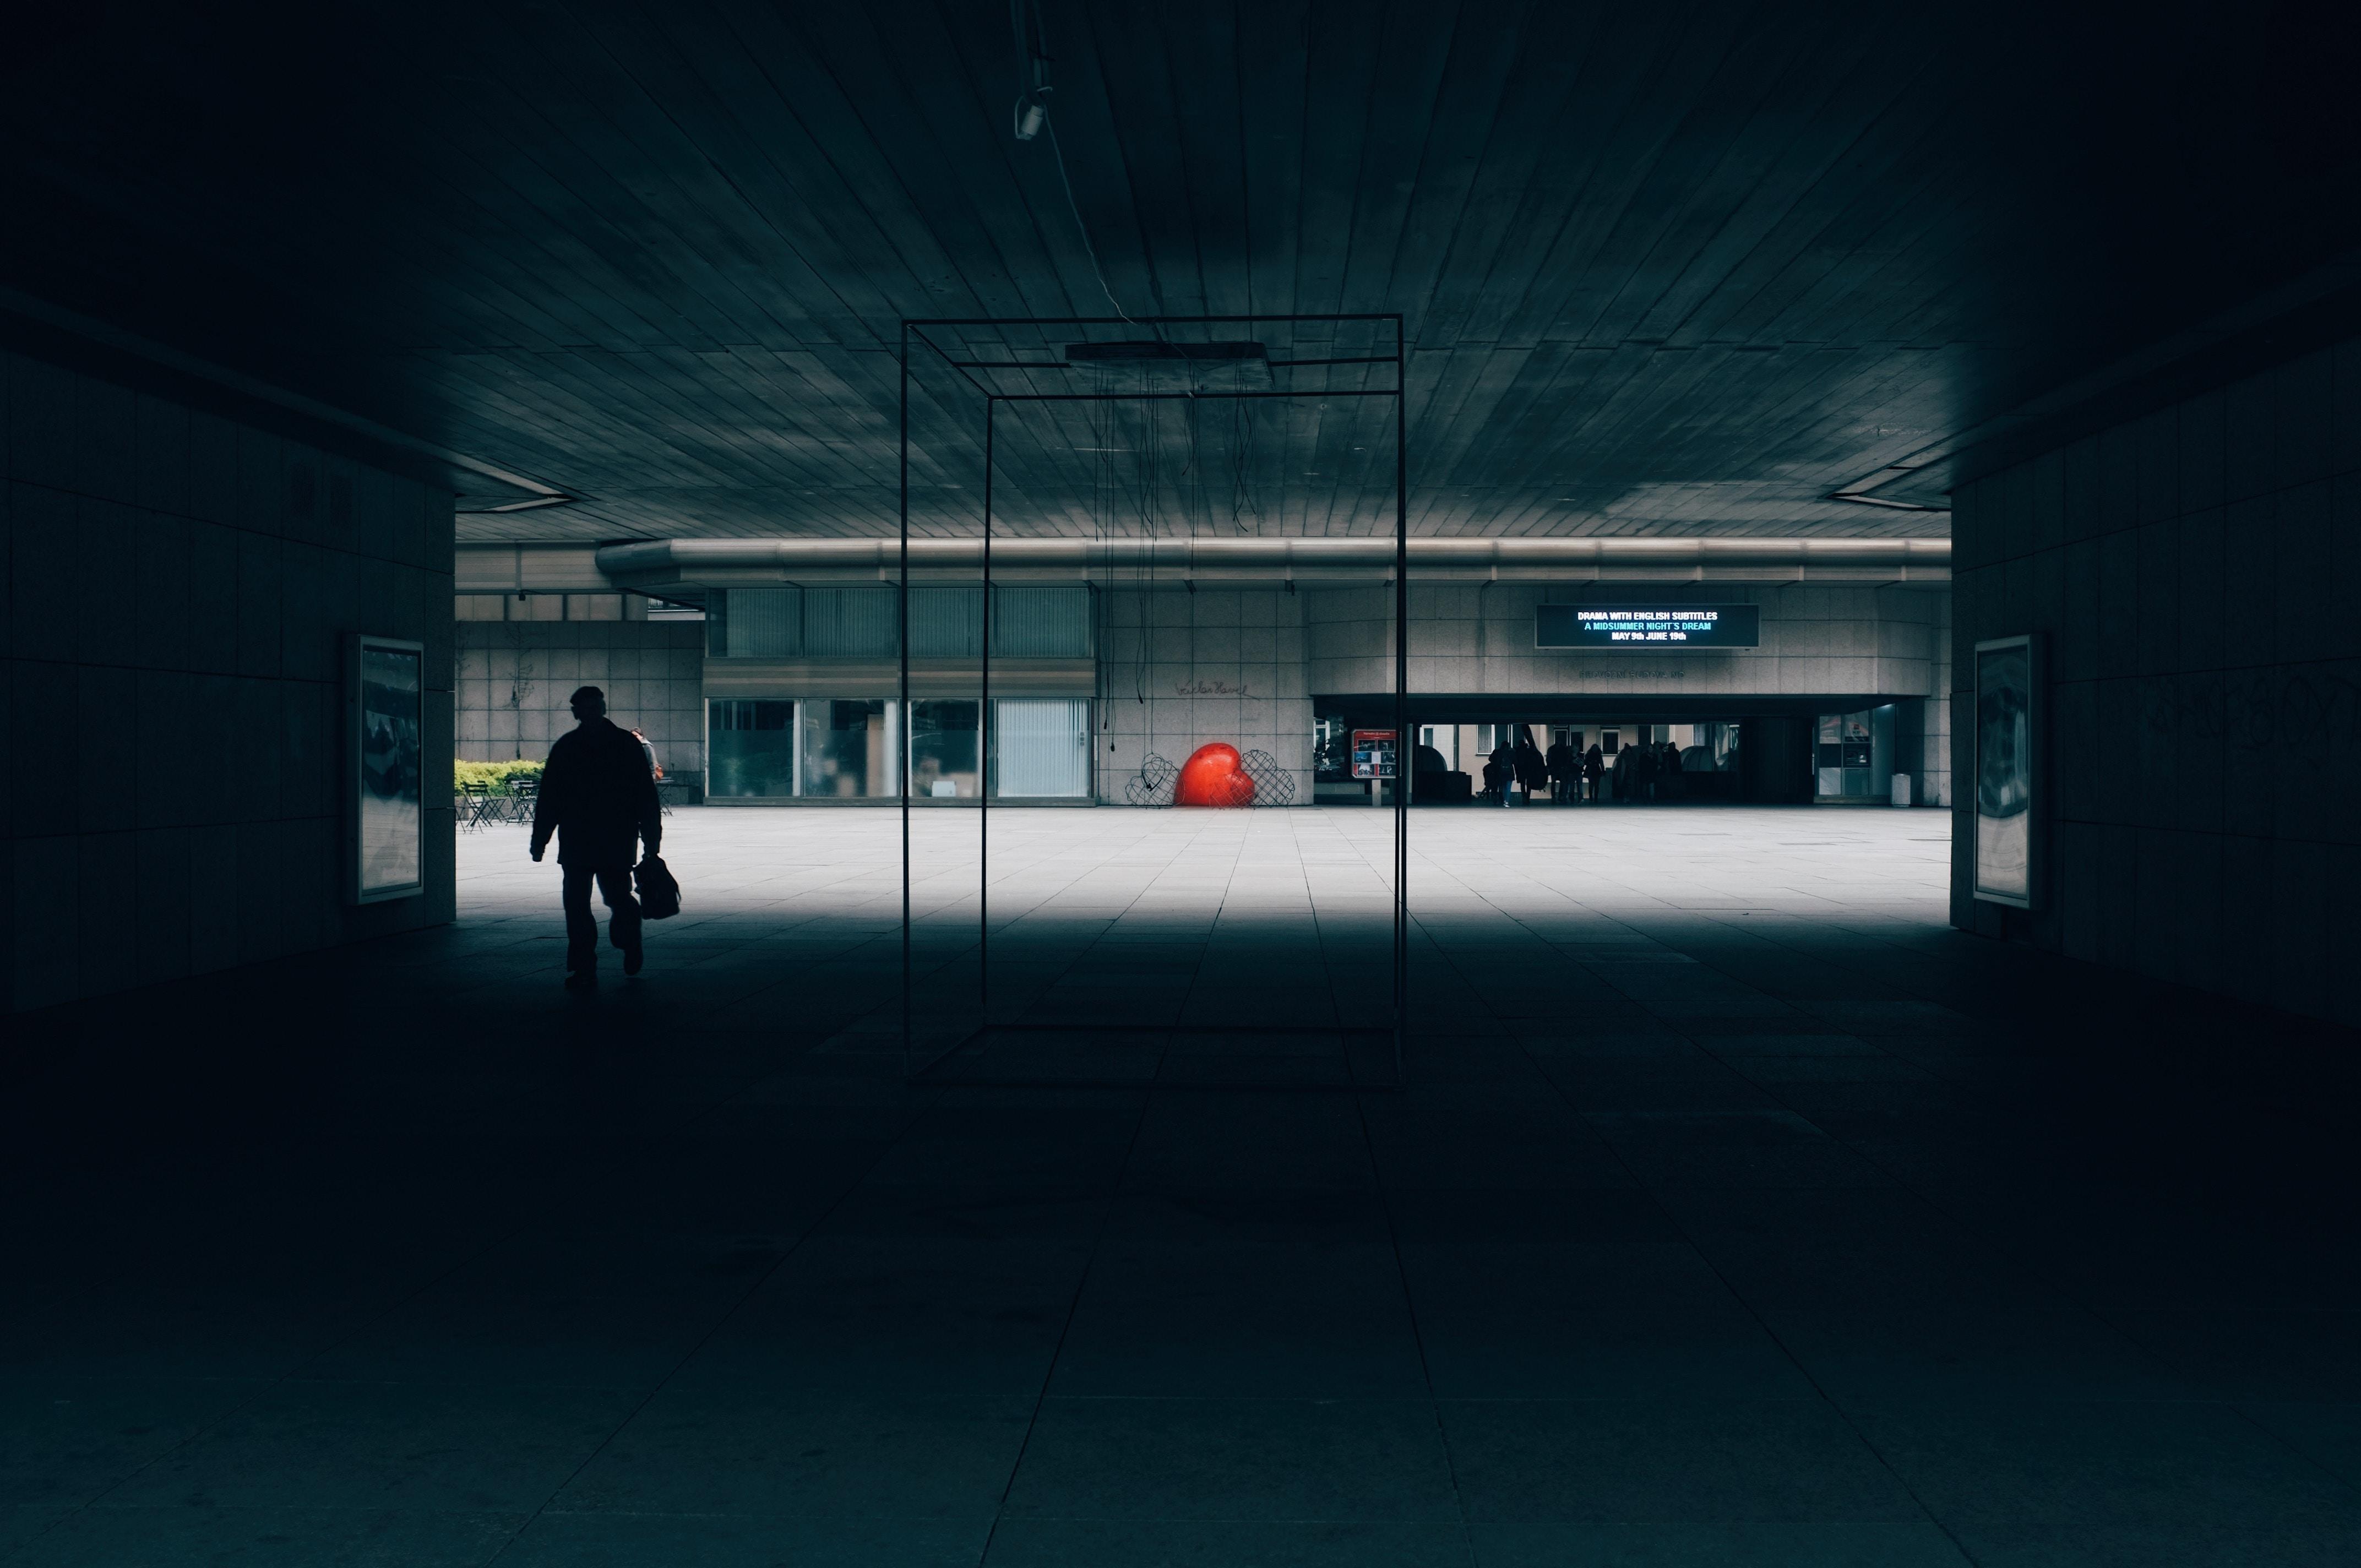 person walking in hallway